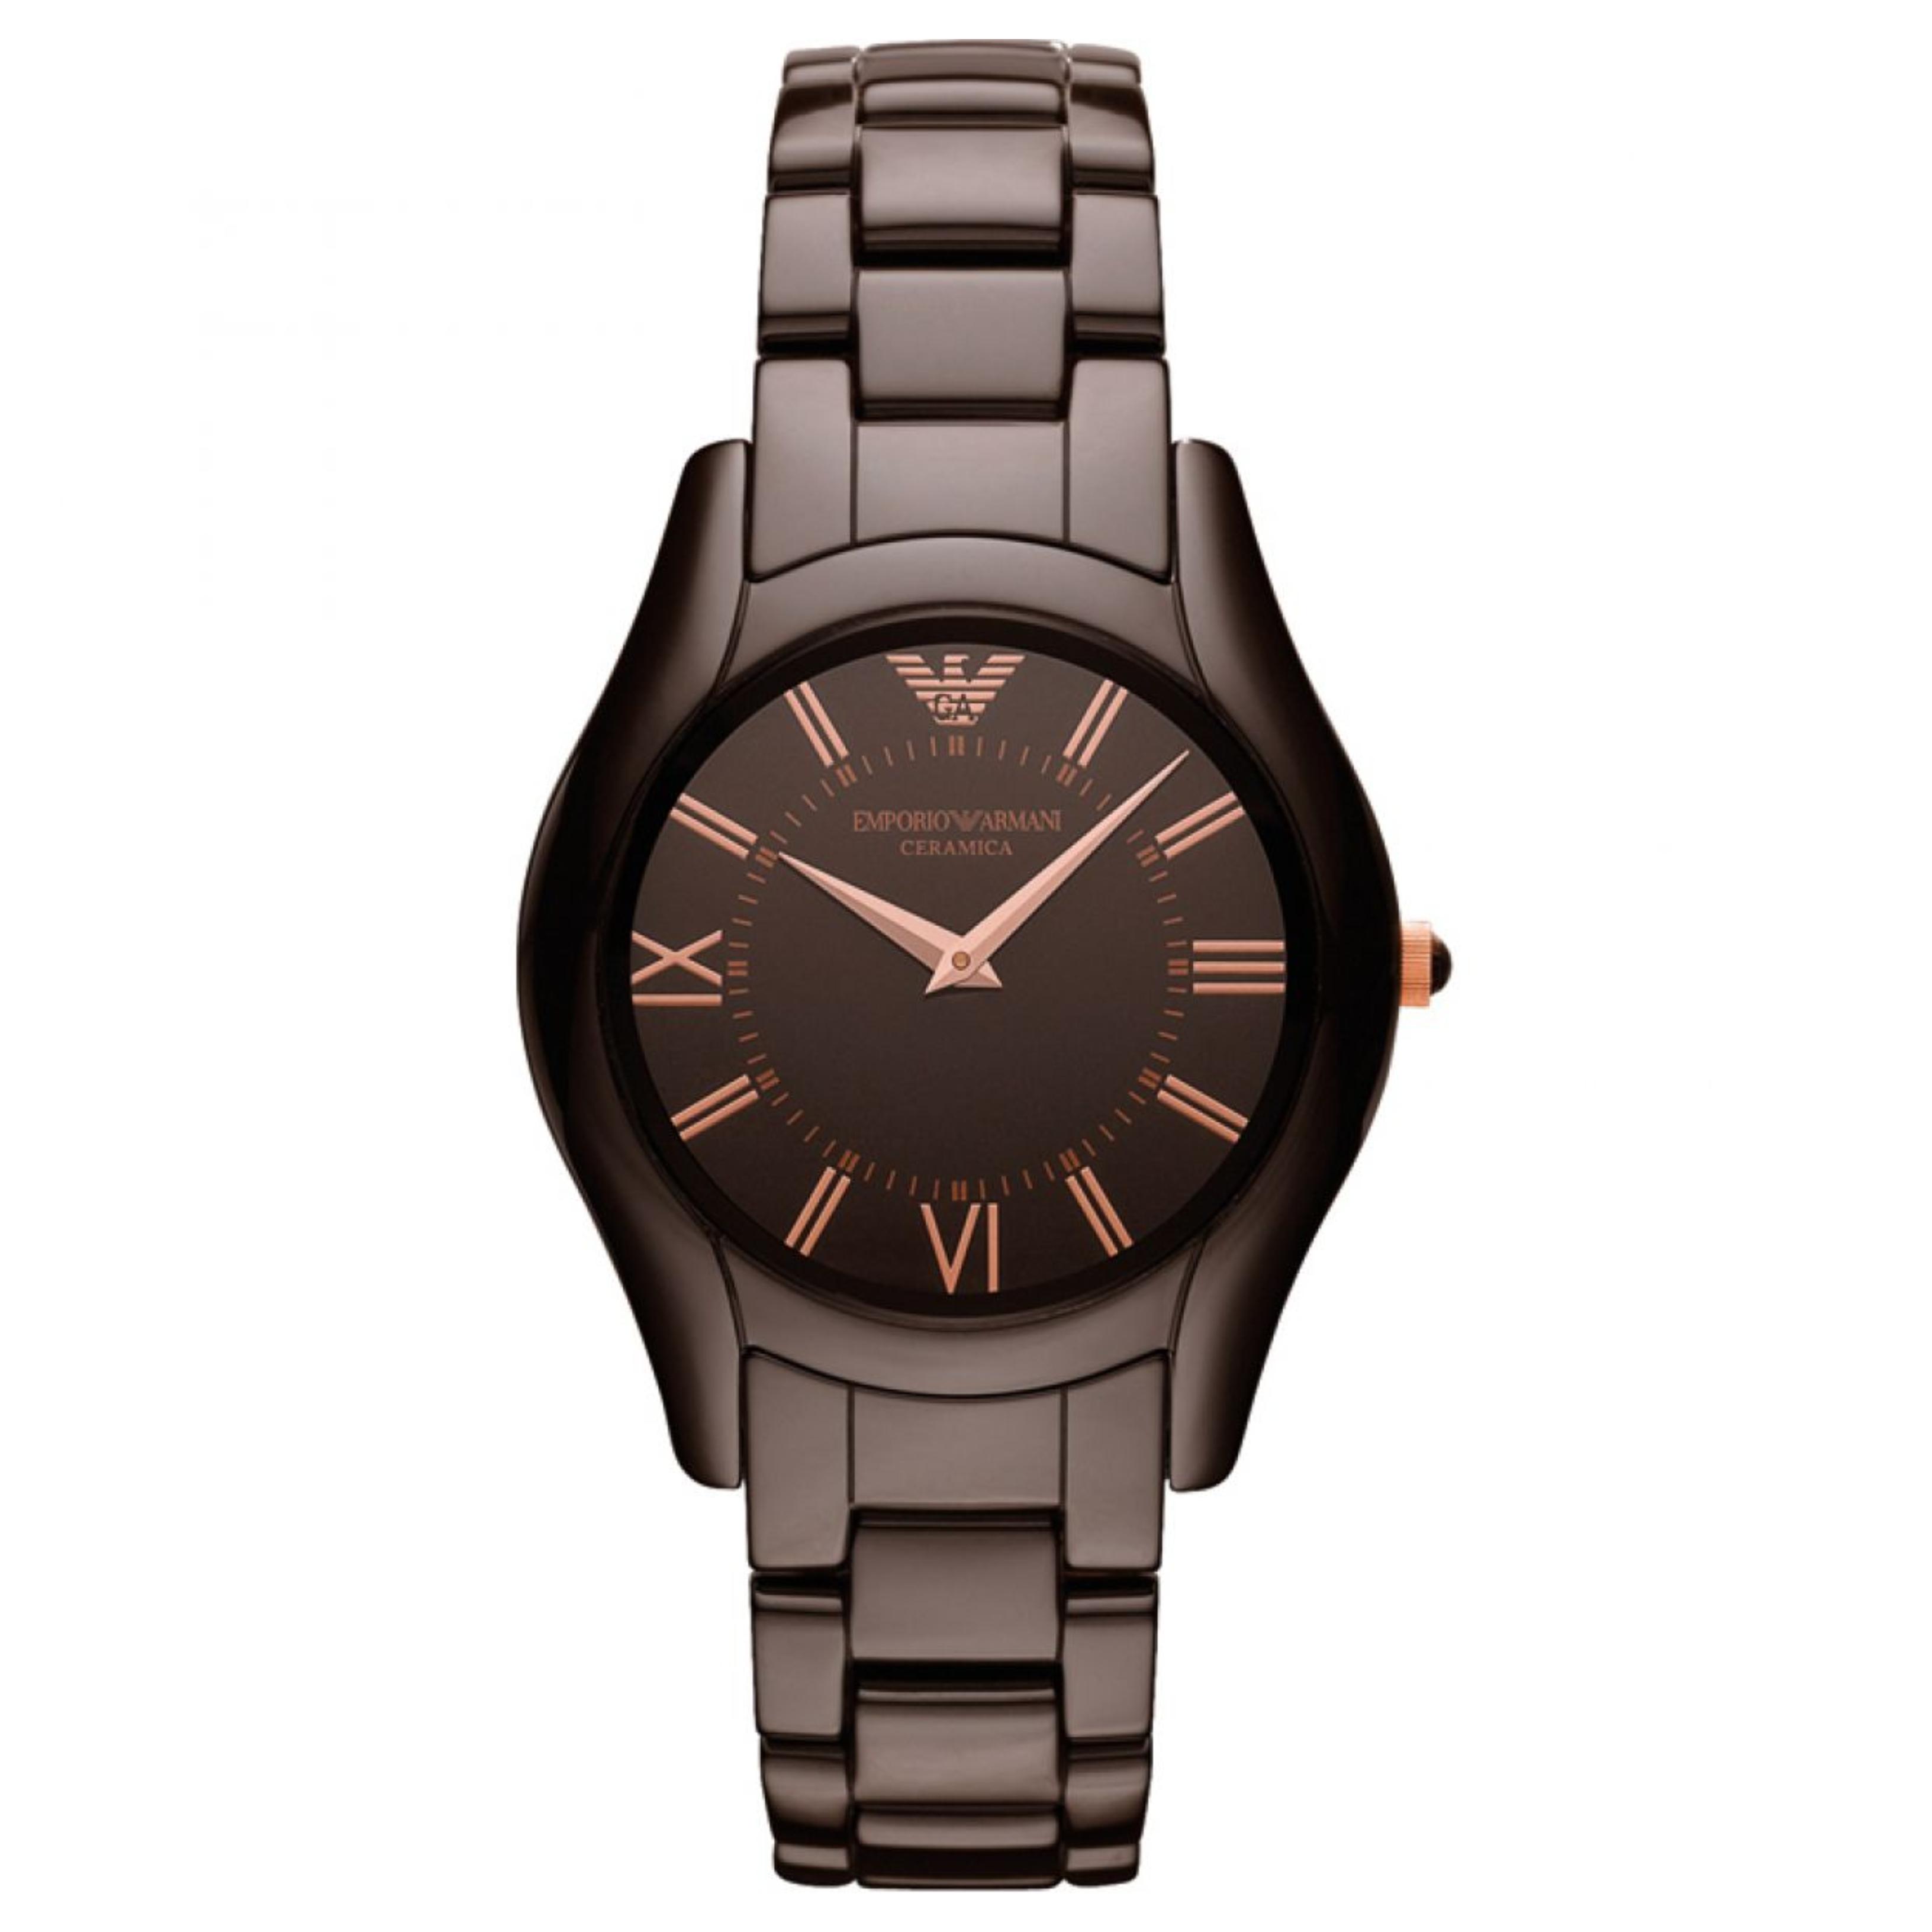 Emporio Armani Ceramica Ladies Watch | Roman Numeral Round Dial | Brown Strap | AR1445